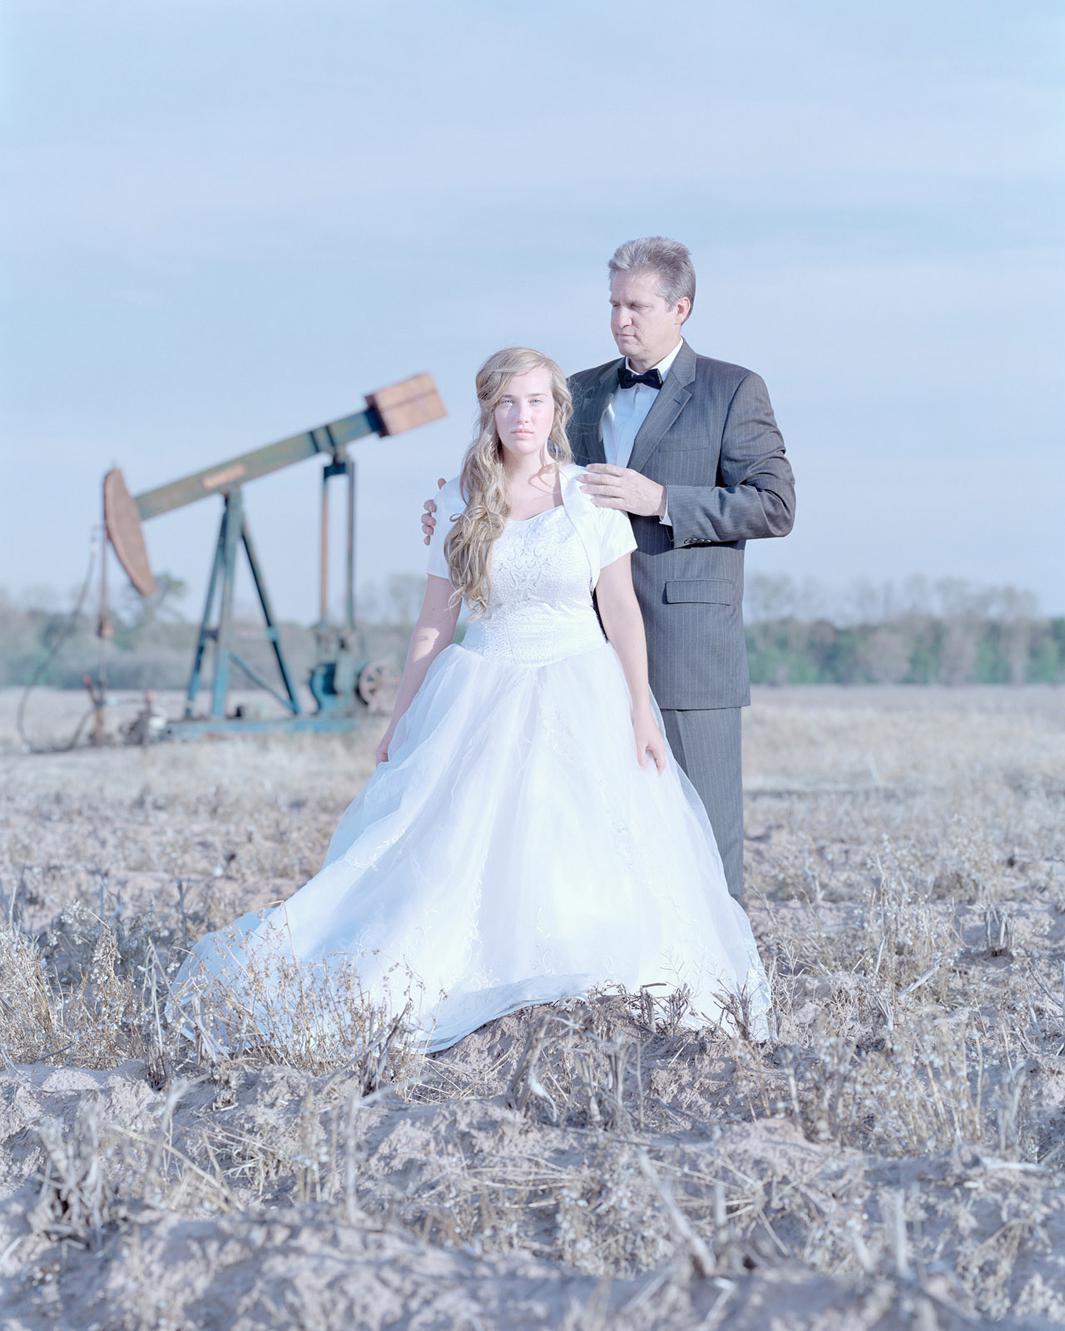 Rose and Randall Smoak, Dixie, Louisiana.